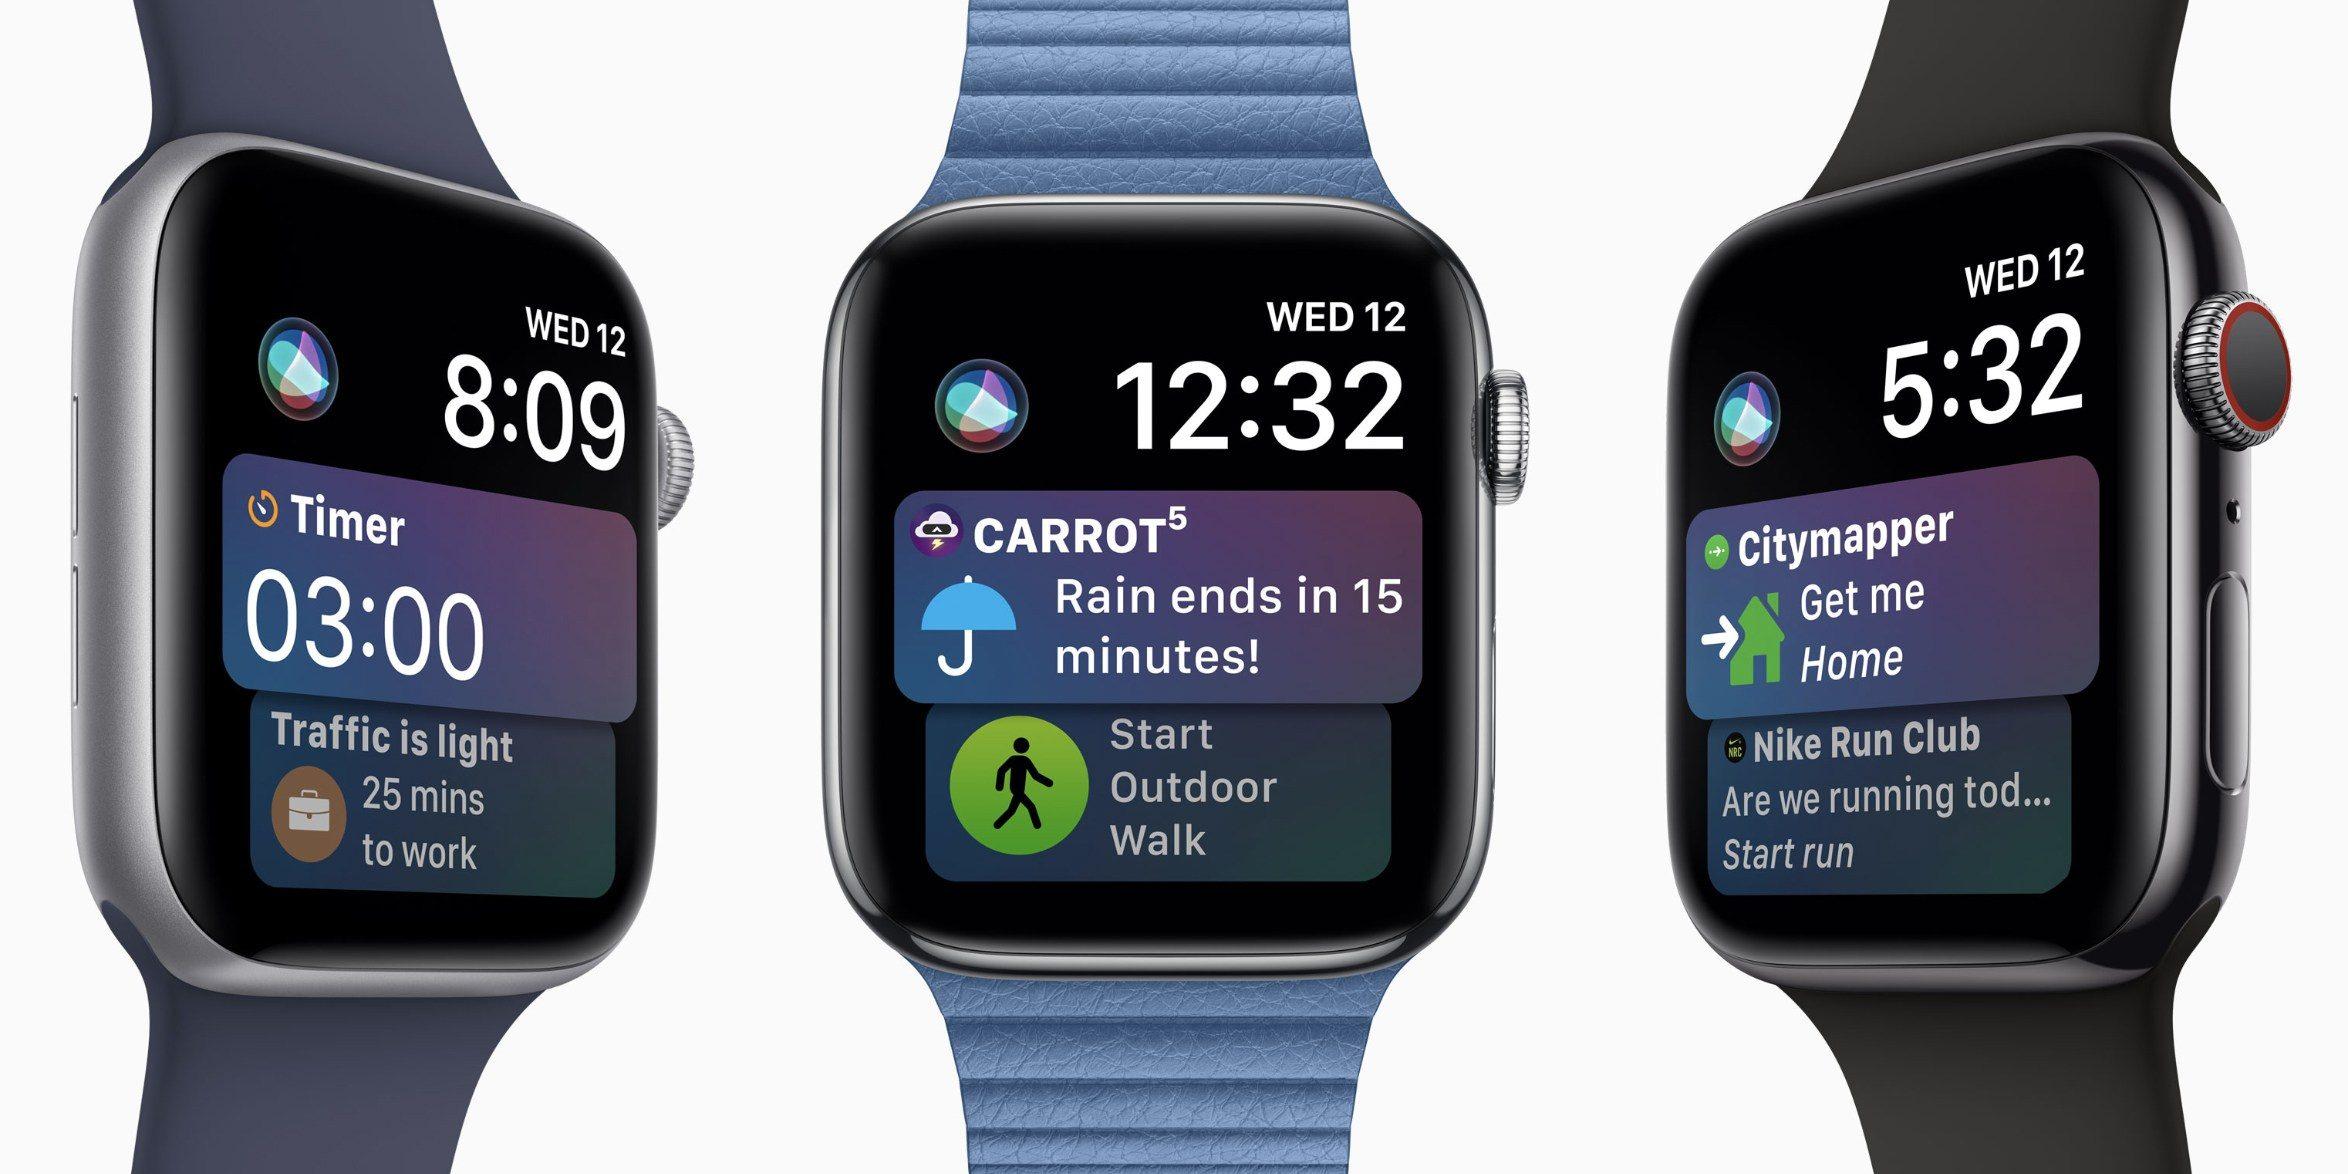 Apple Watch Series 4 $70 off, refurb iPhone 7 deals, more